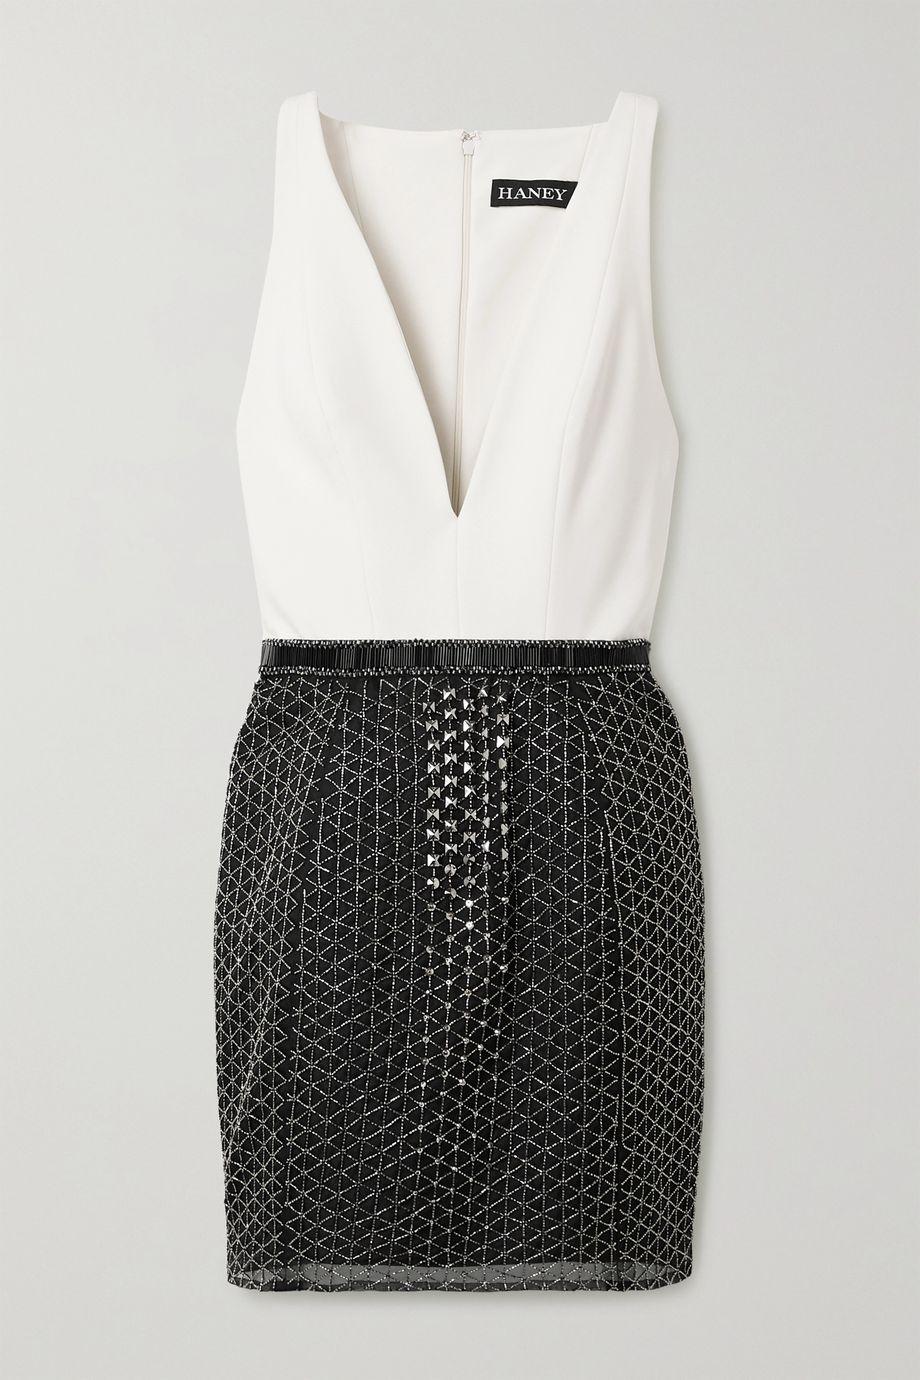 Haney Delilah embellished crepe and chiffon mini dress